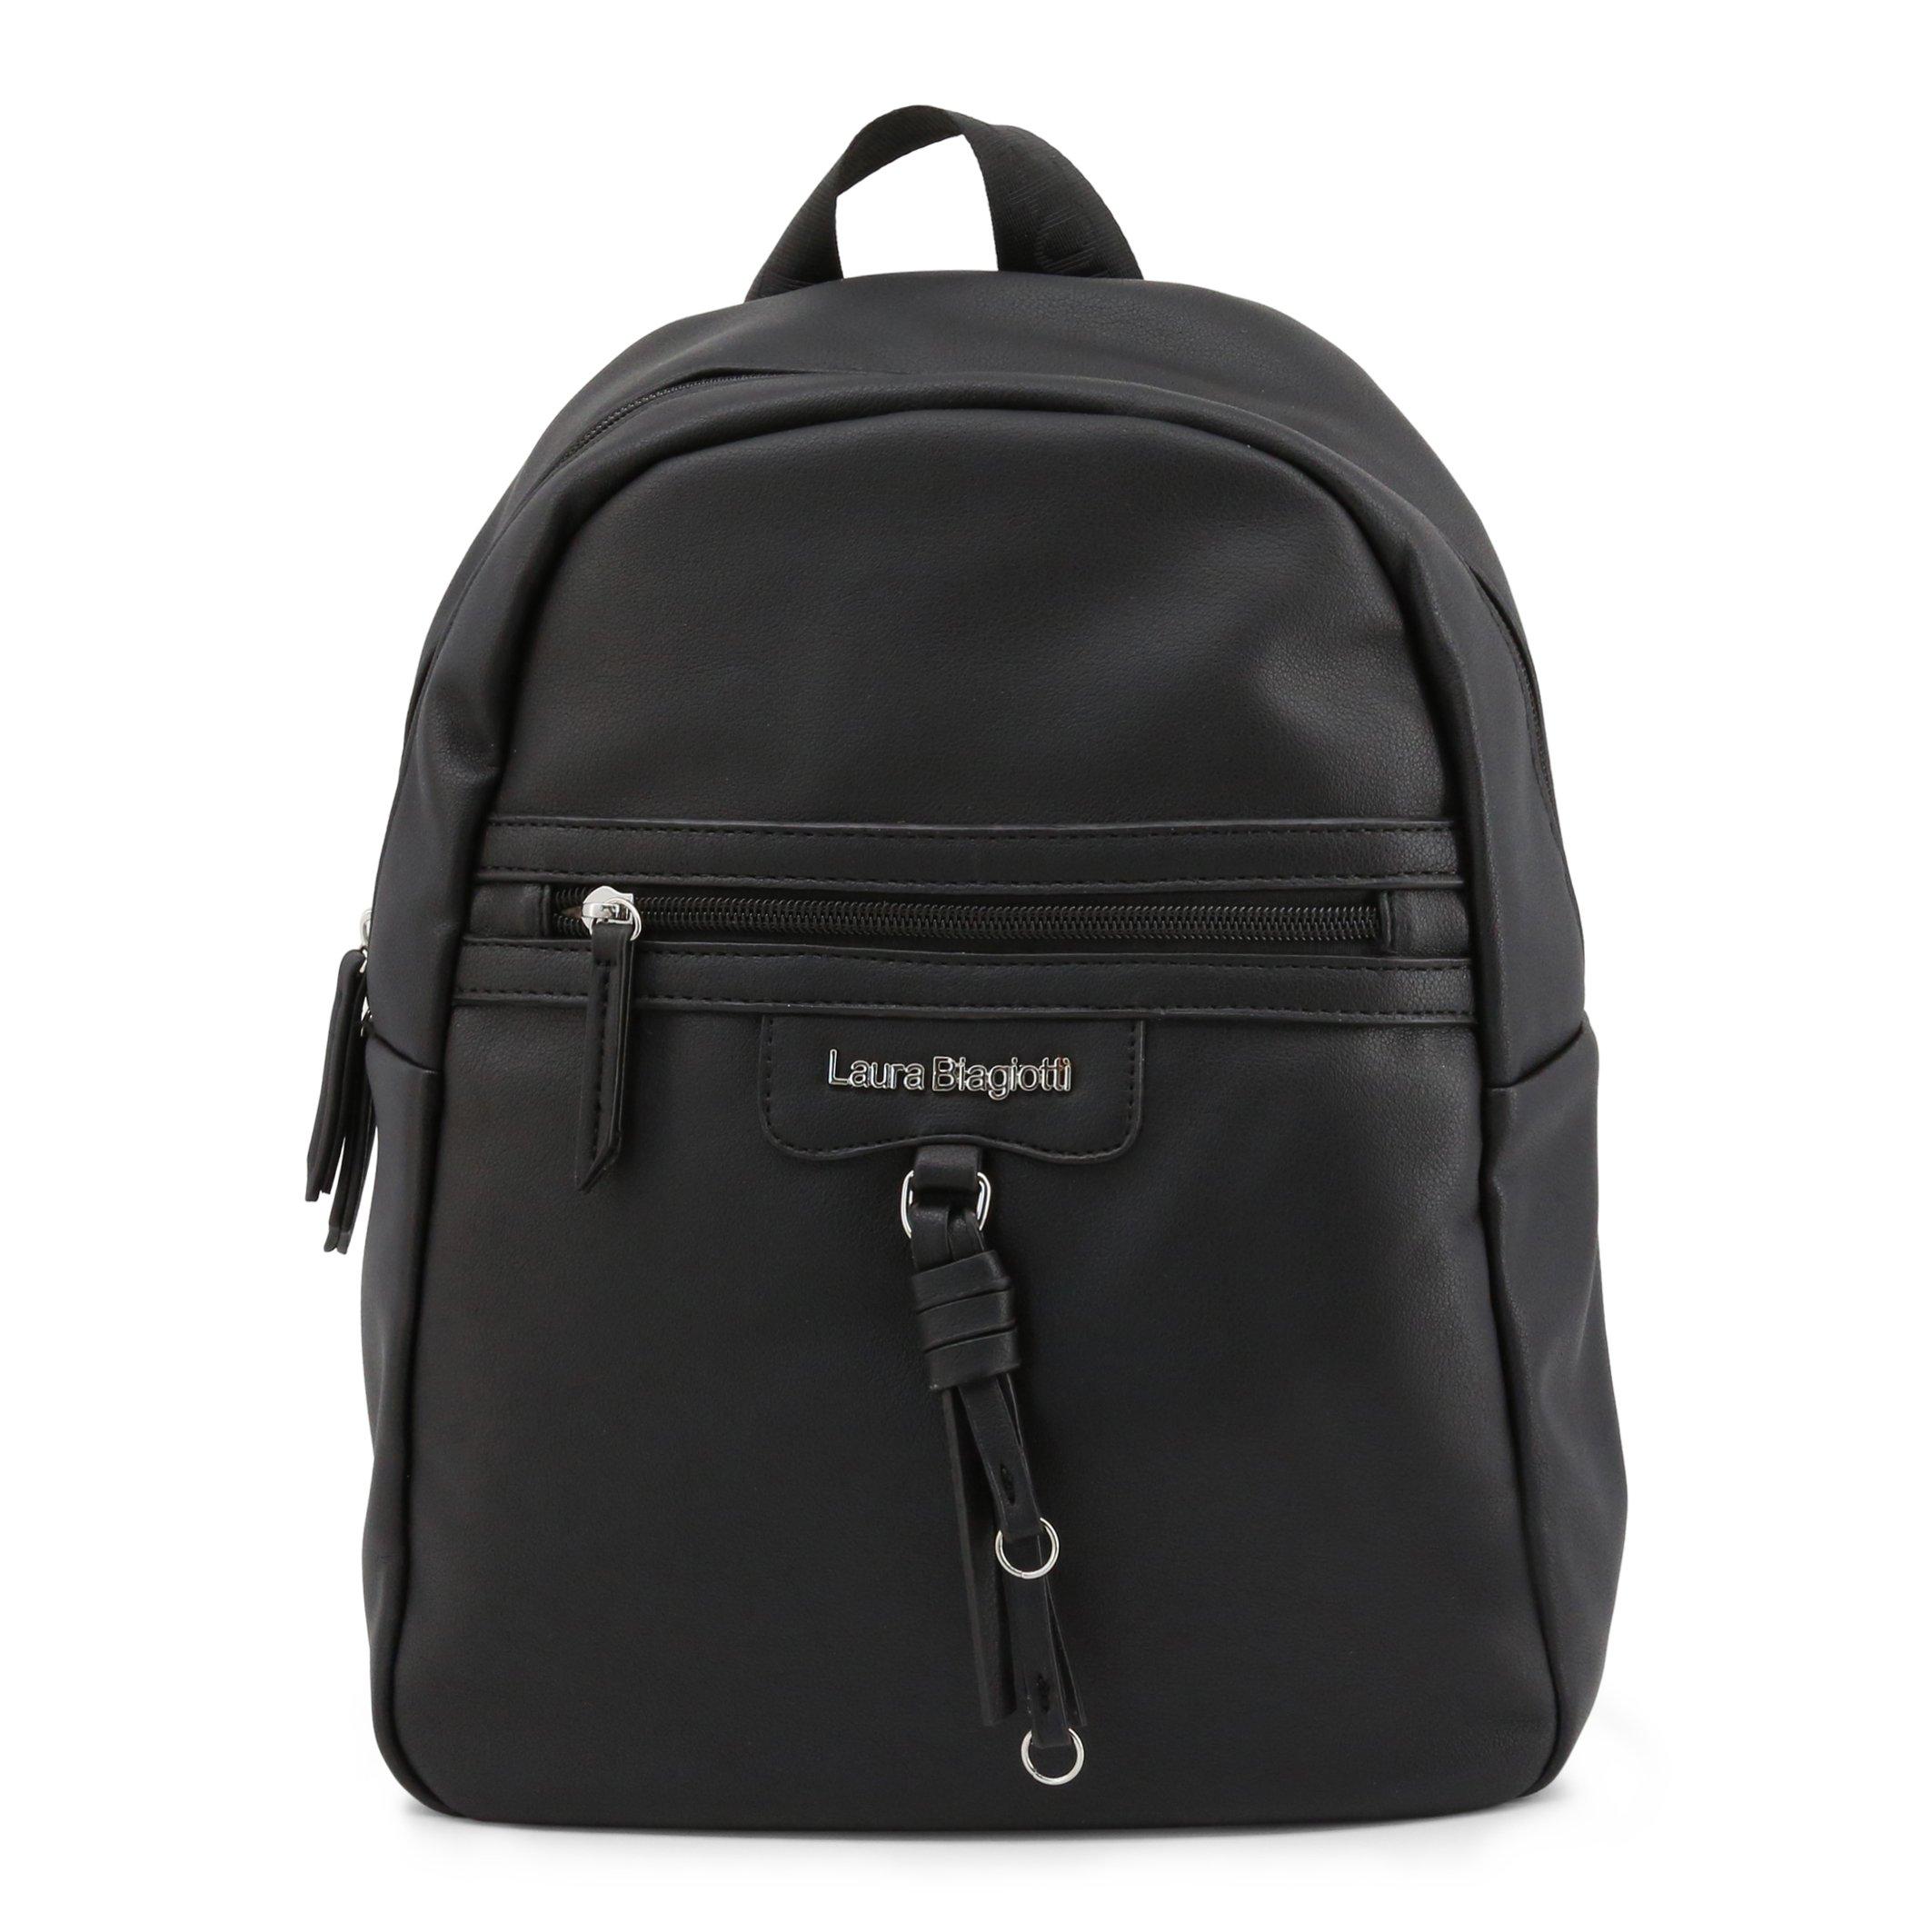 Laura Biagiotti Women's Backpack White Ramsey_103-4 - black NOSIZE